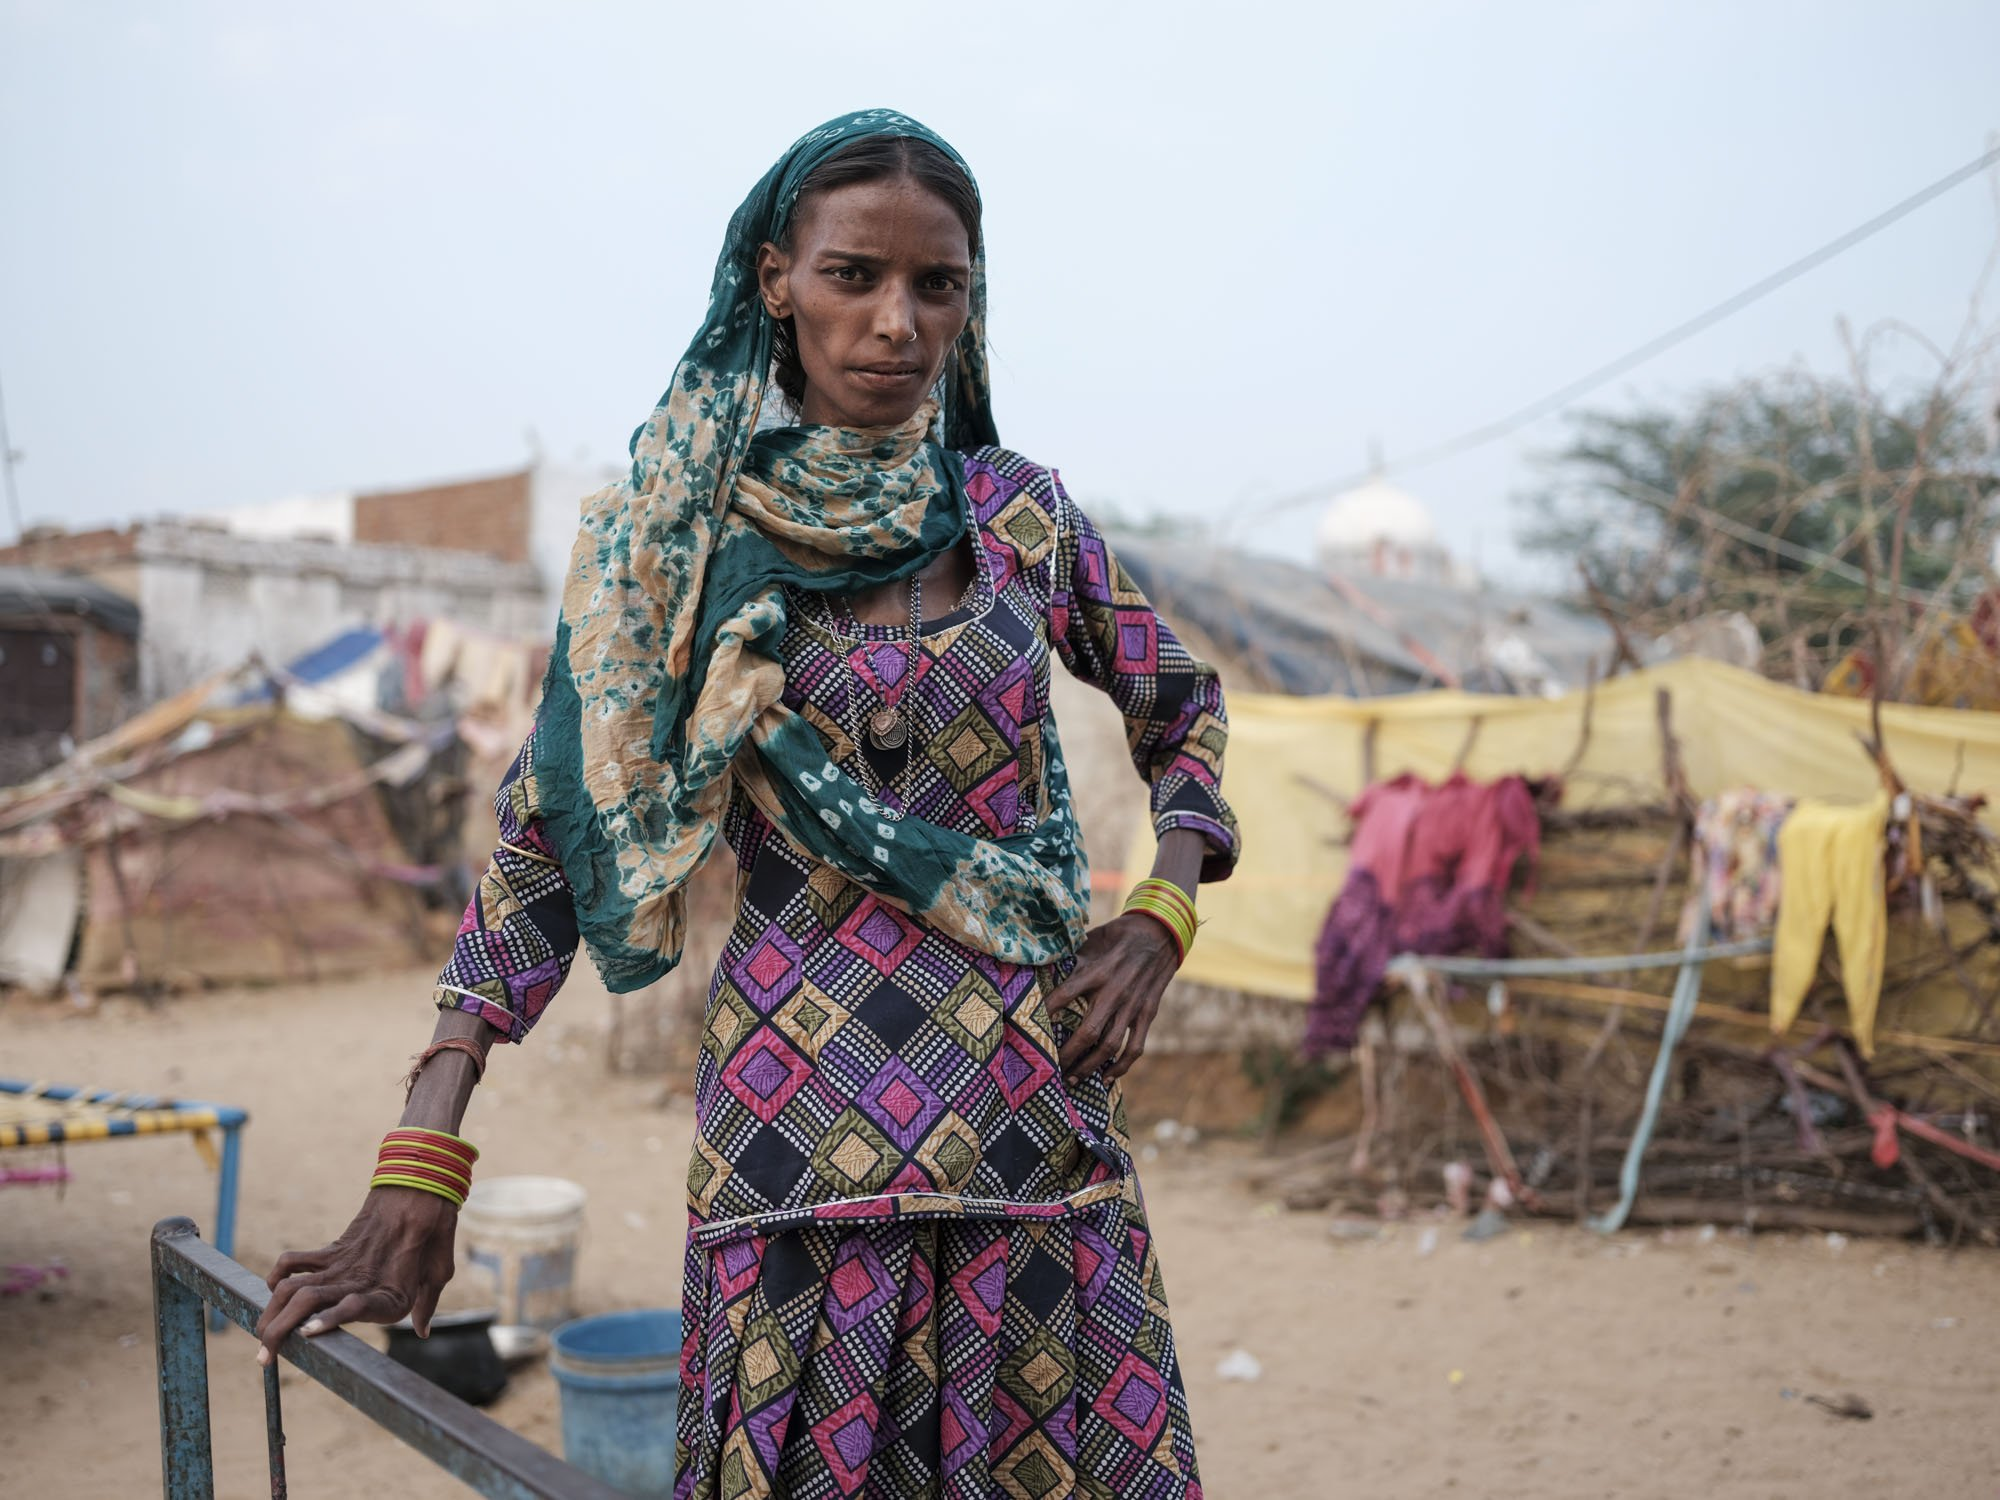 woman Gypsy Kalbelia tribe nomad Rajasthan India Documentary Photography Jose Jeuland Photographer print fine art